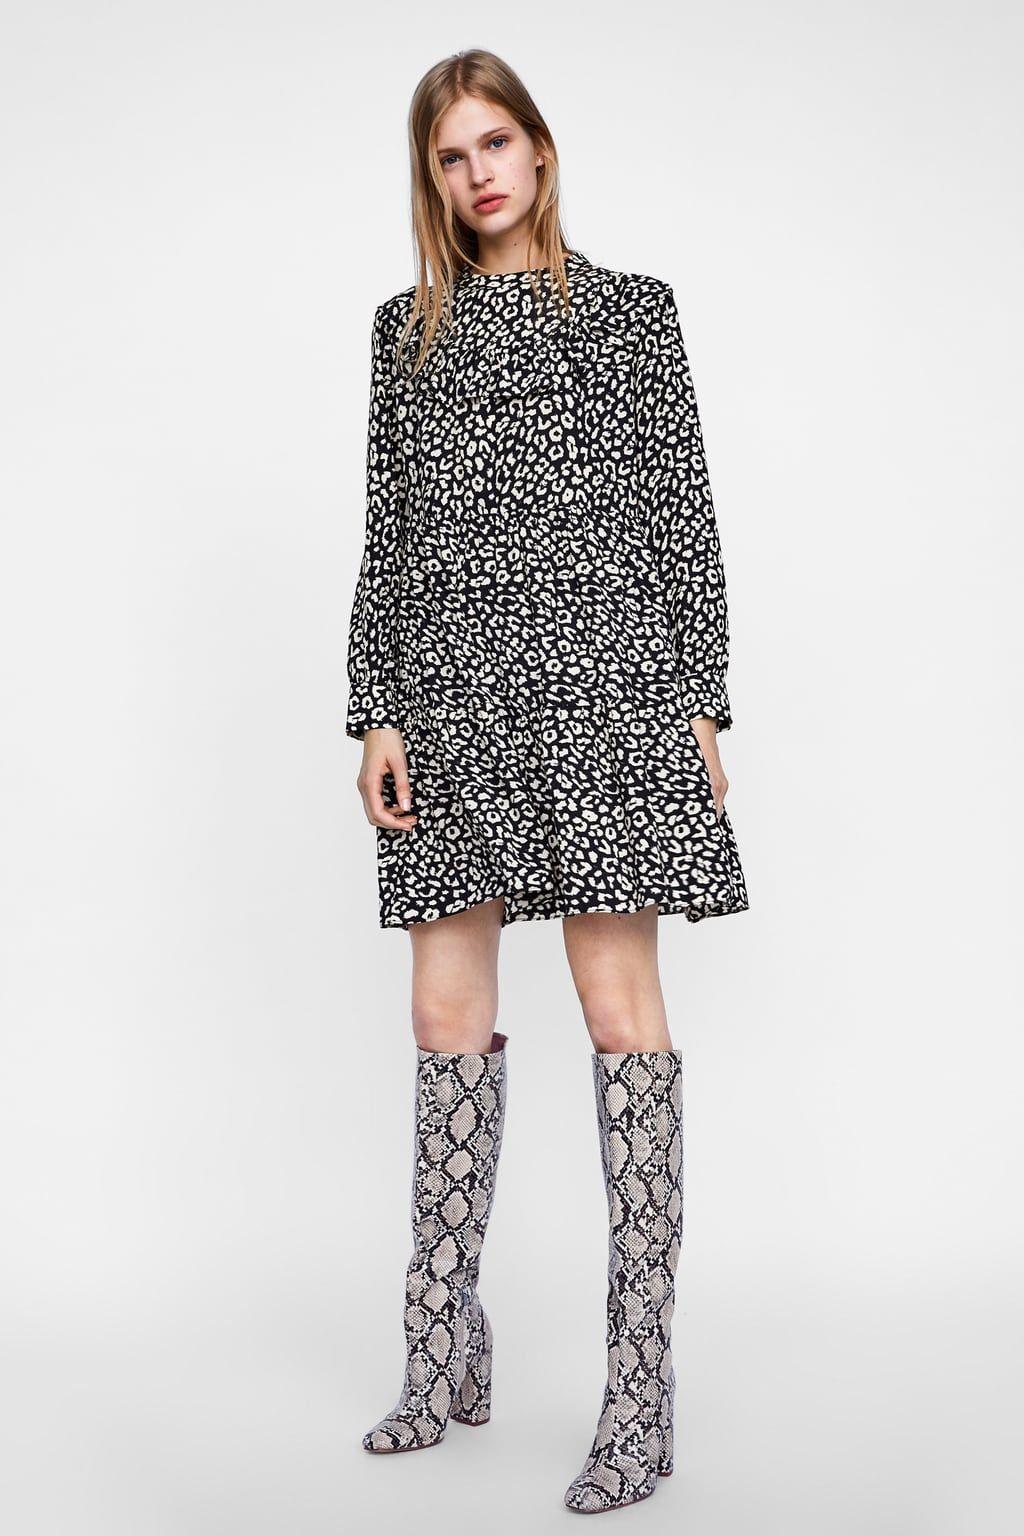 5f6589442d Image 1 of RUFFLED ANIMAL PRINT DRESS from Zara